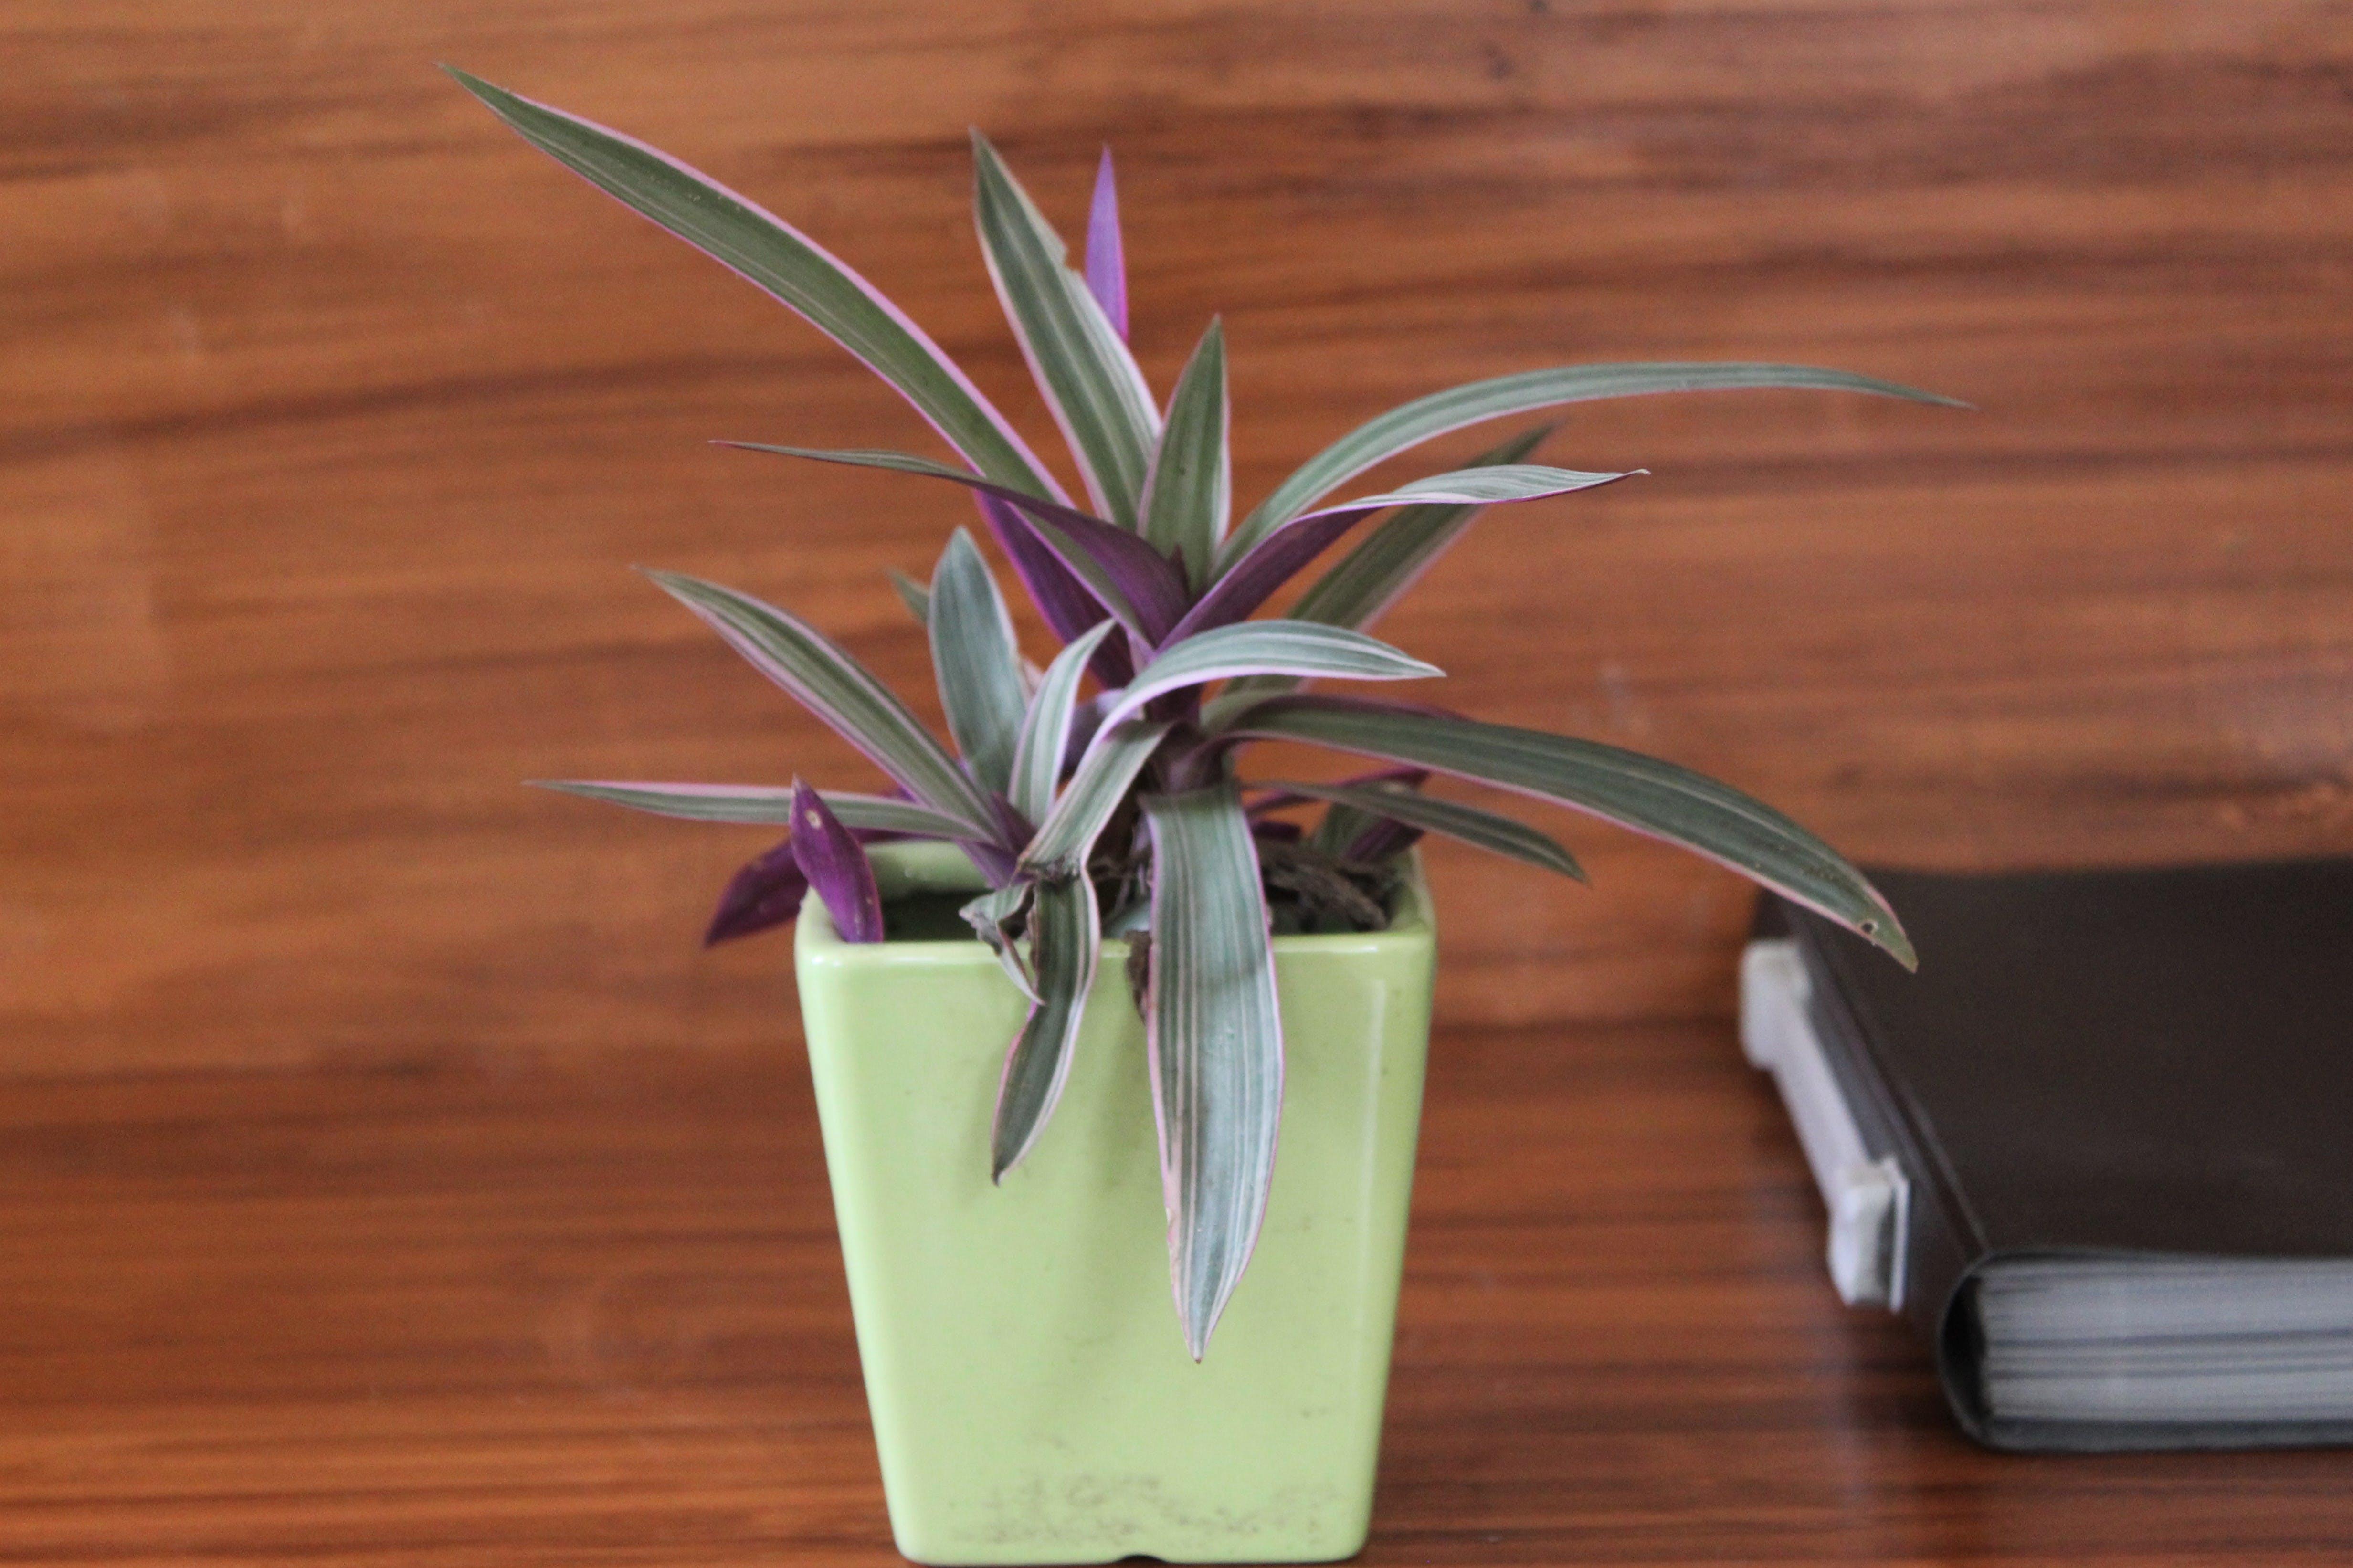 Free stock photo of beautiful plants, close up, interior, nature